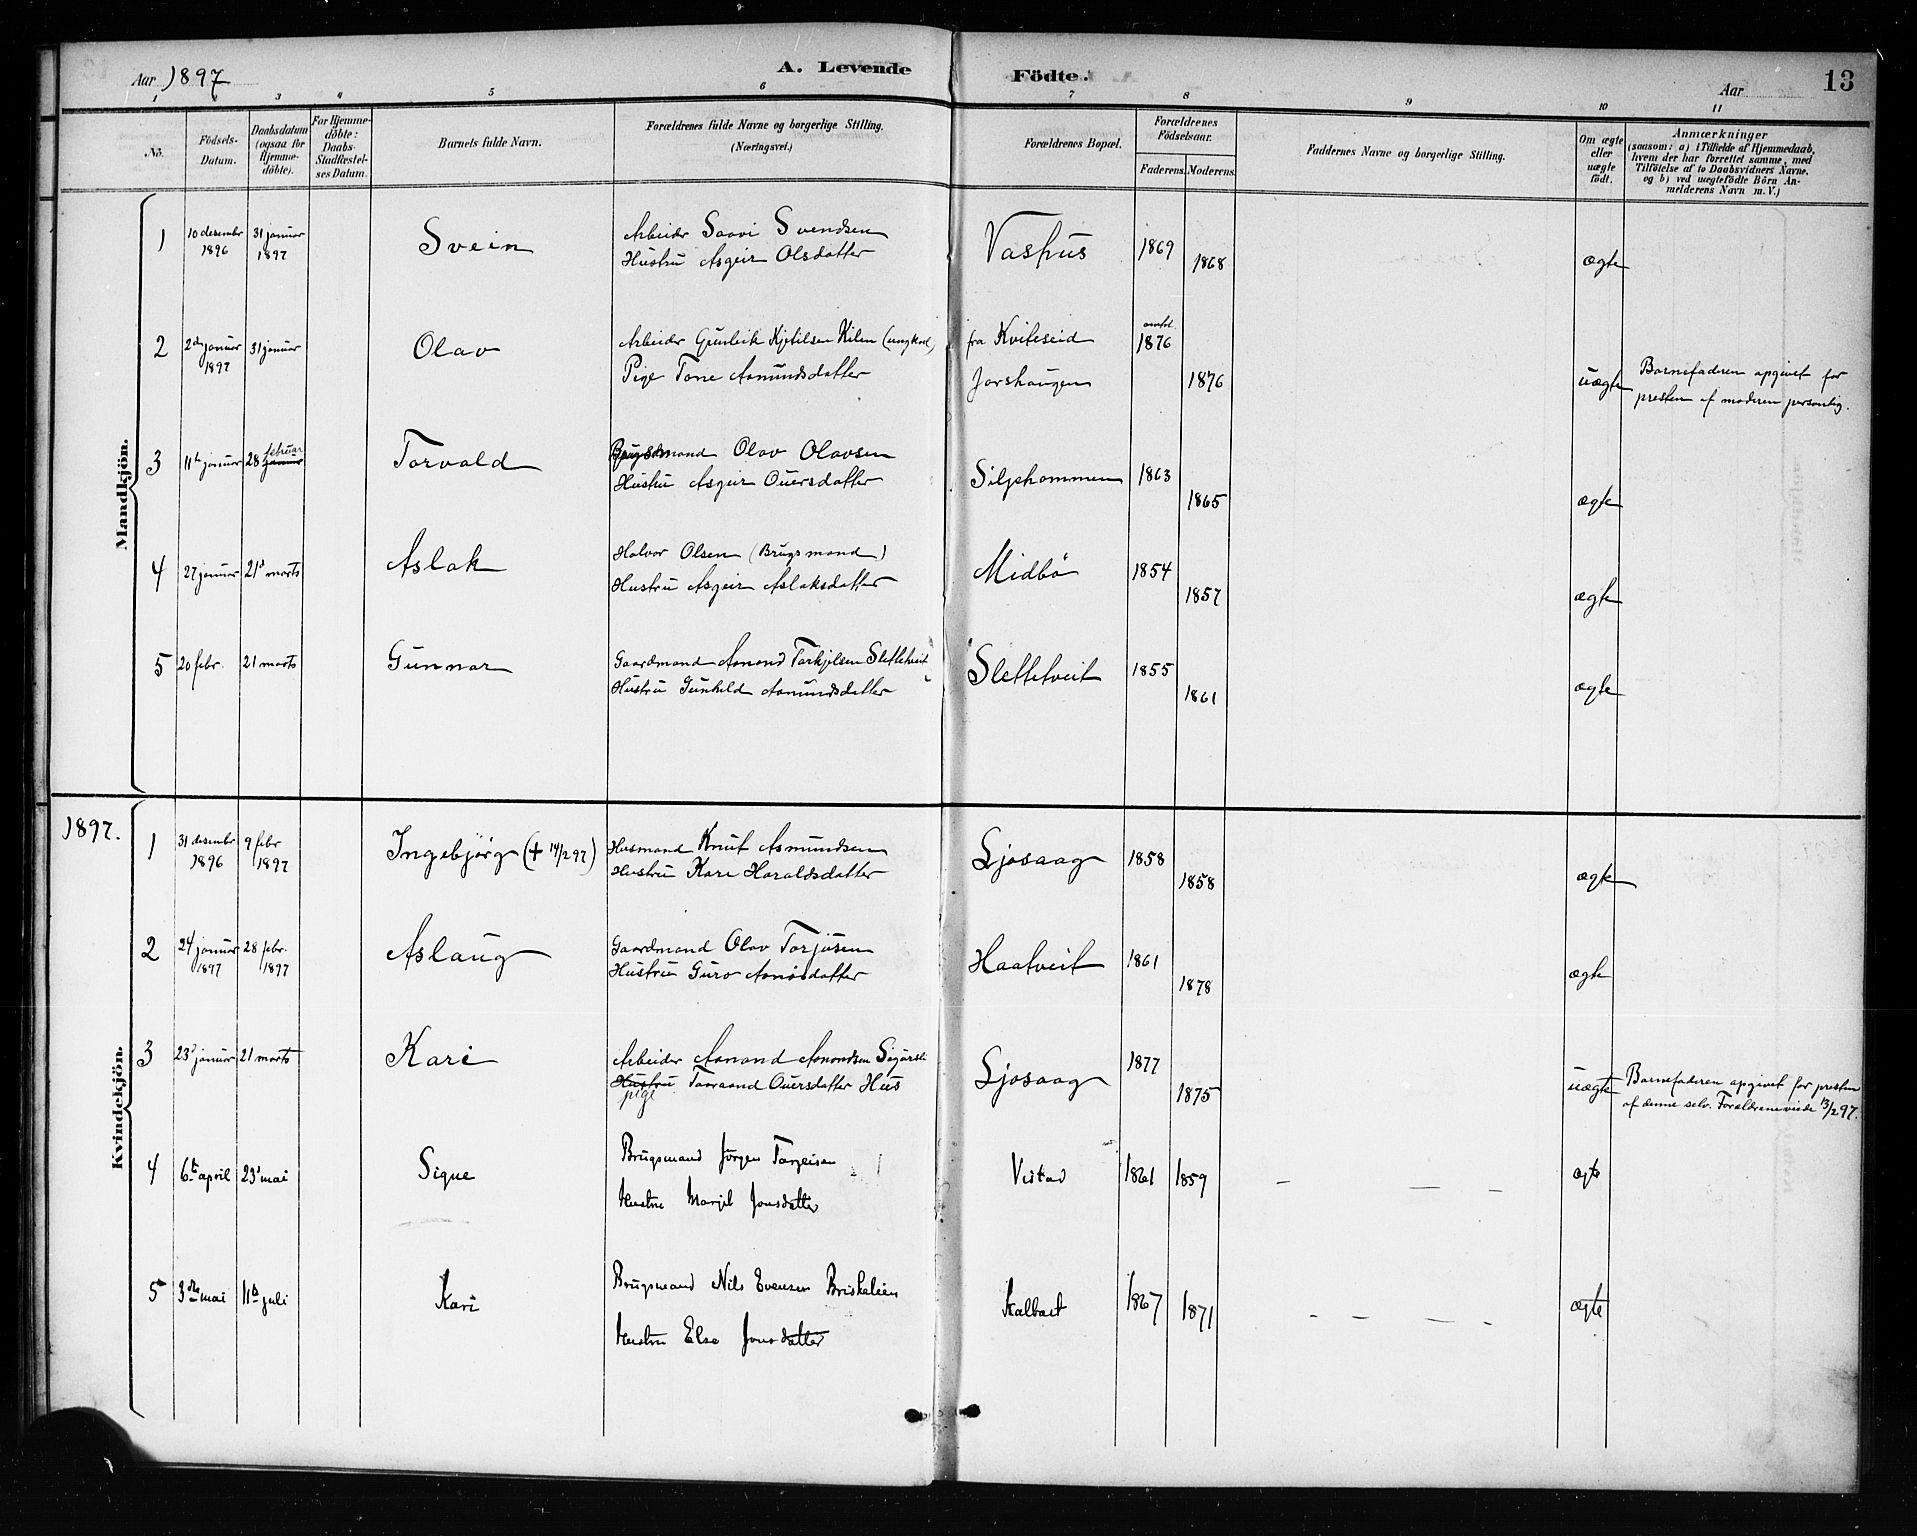 SAKO, Mo kirkebøker, G/Ga/L0002: Klokkerbok nr. I 2, 1892-1914, s. 13